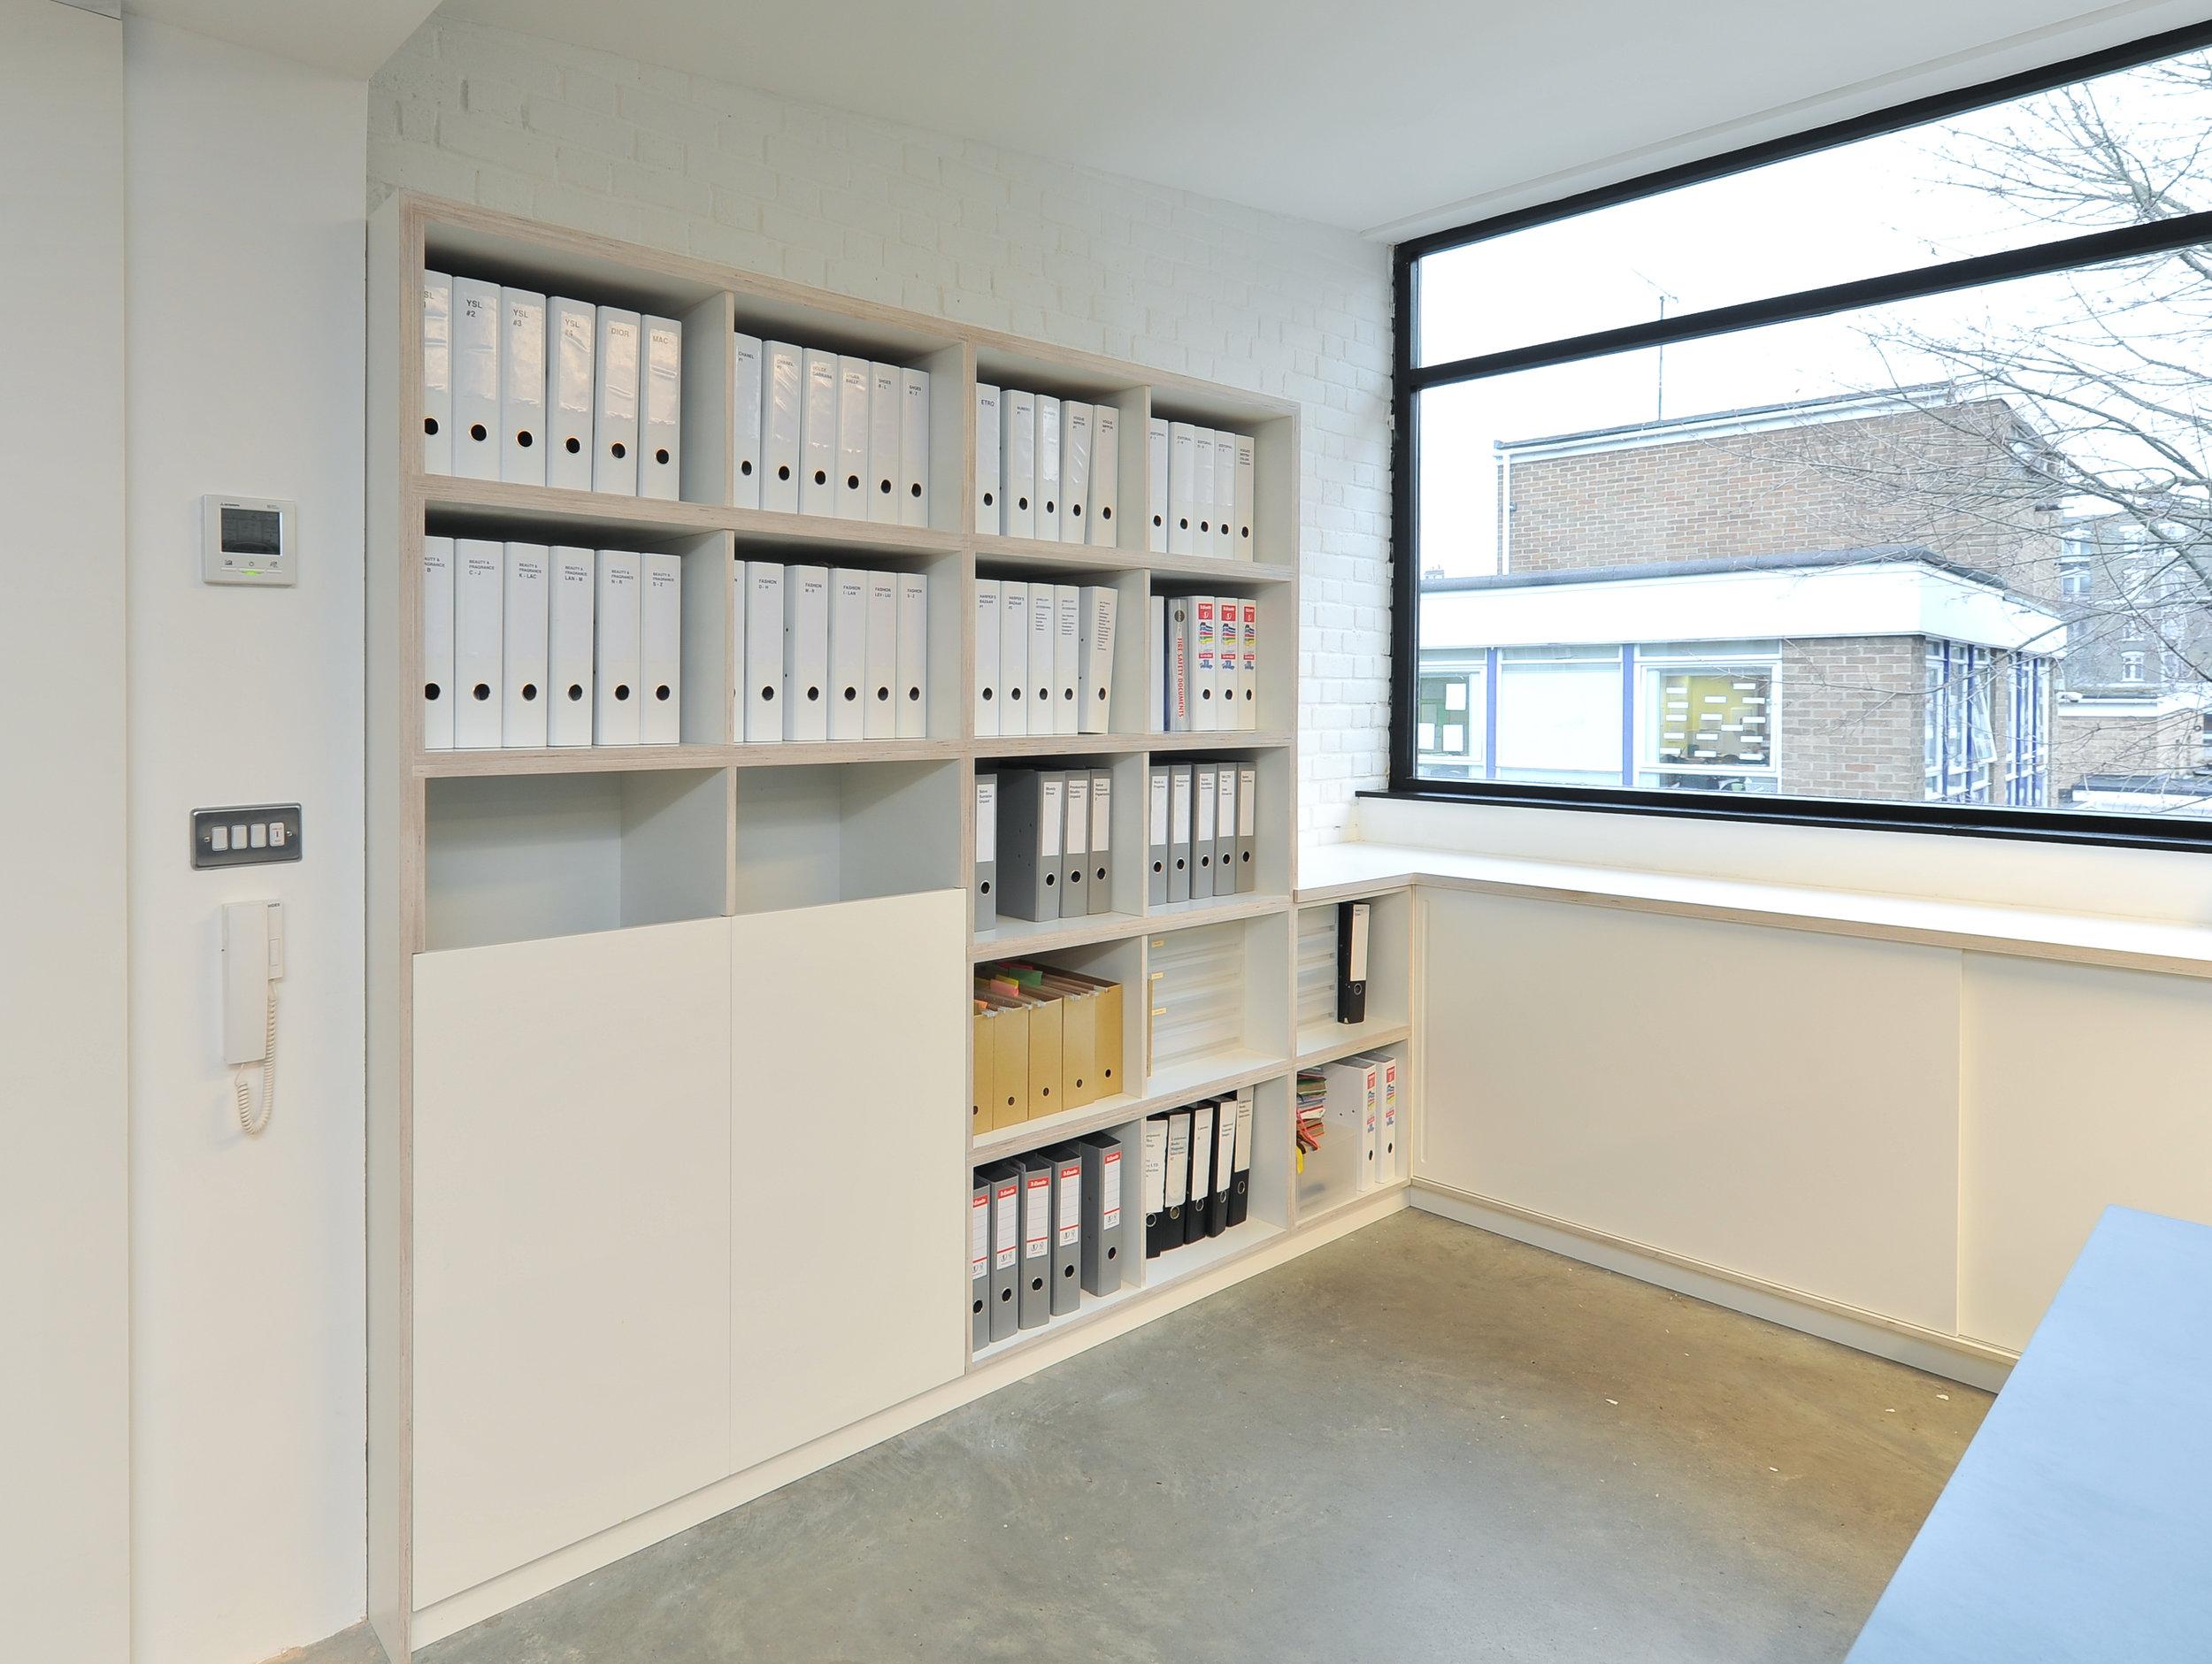 Project: Photographer's Studio & Office